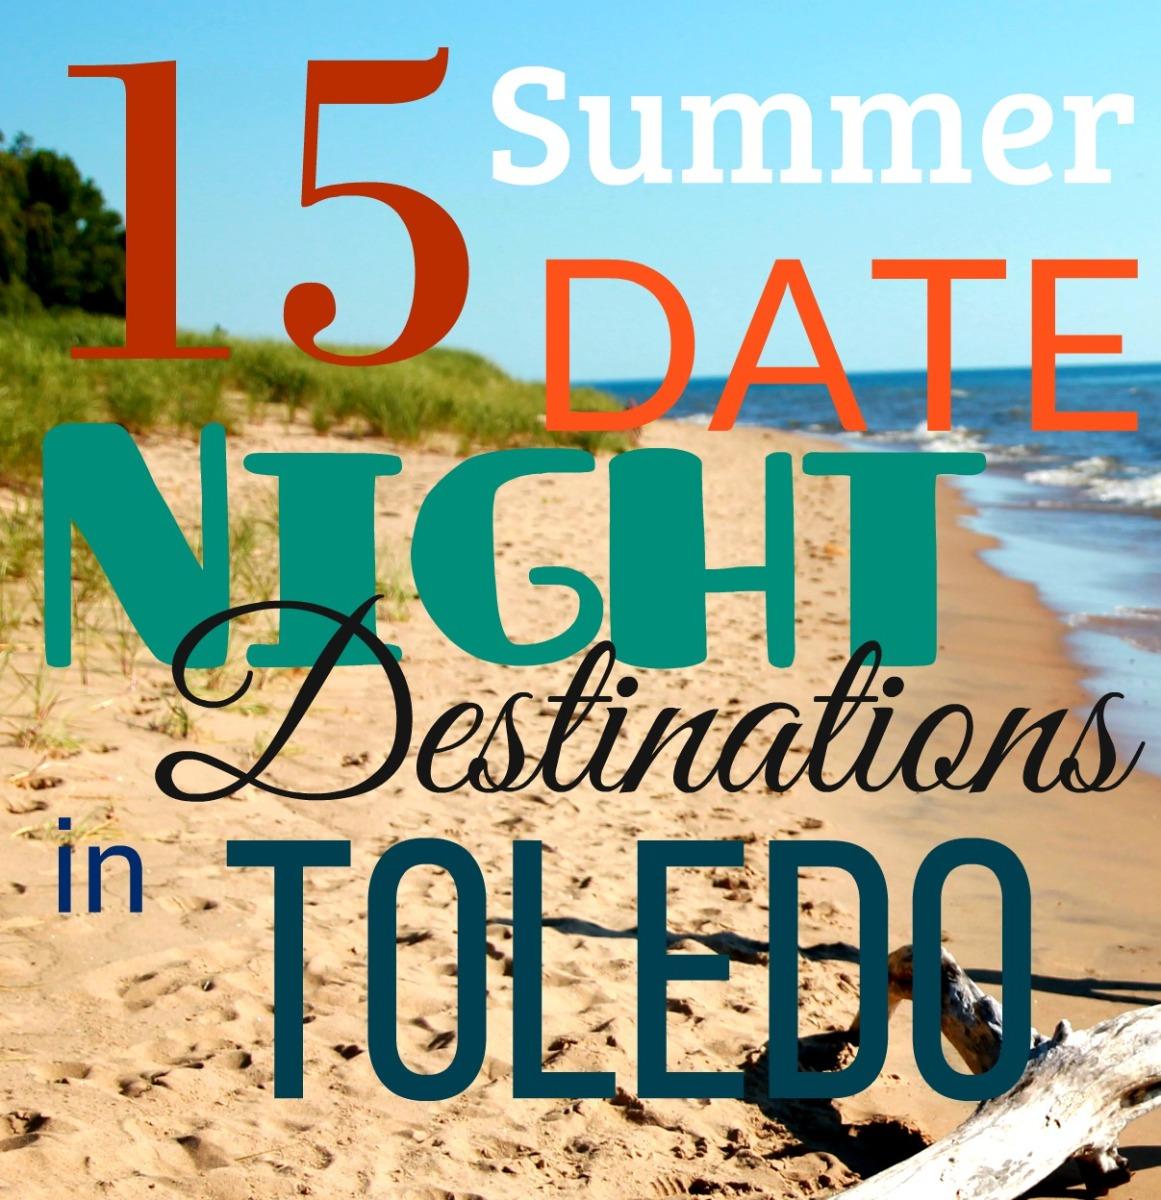 15 Summer Date Night Destinations In Toledo!!